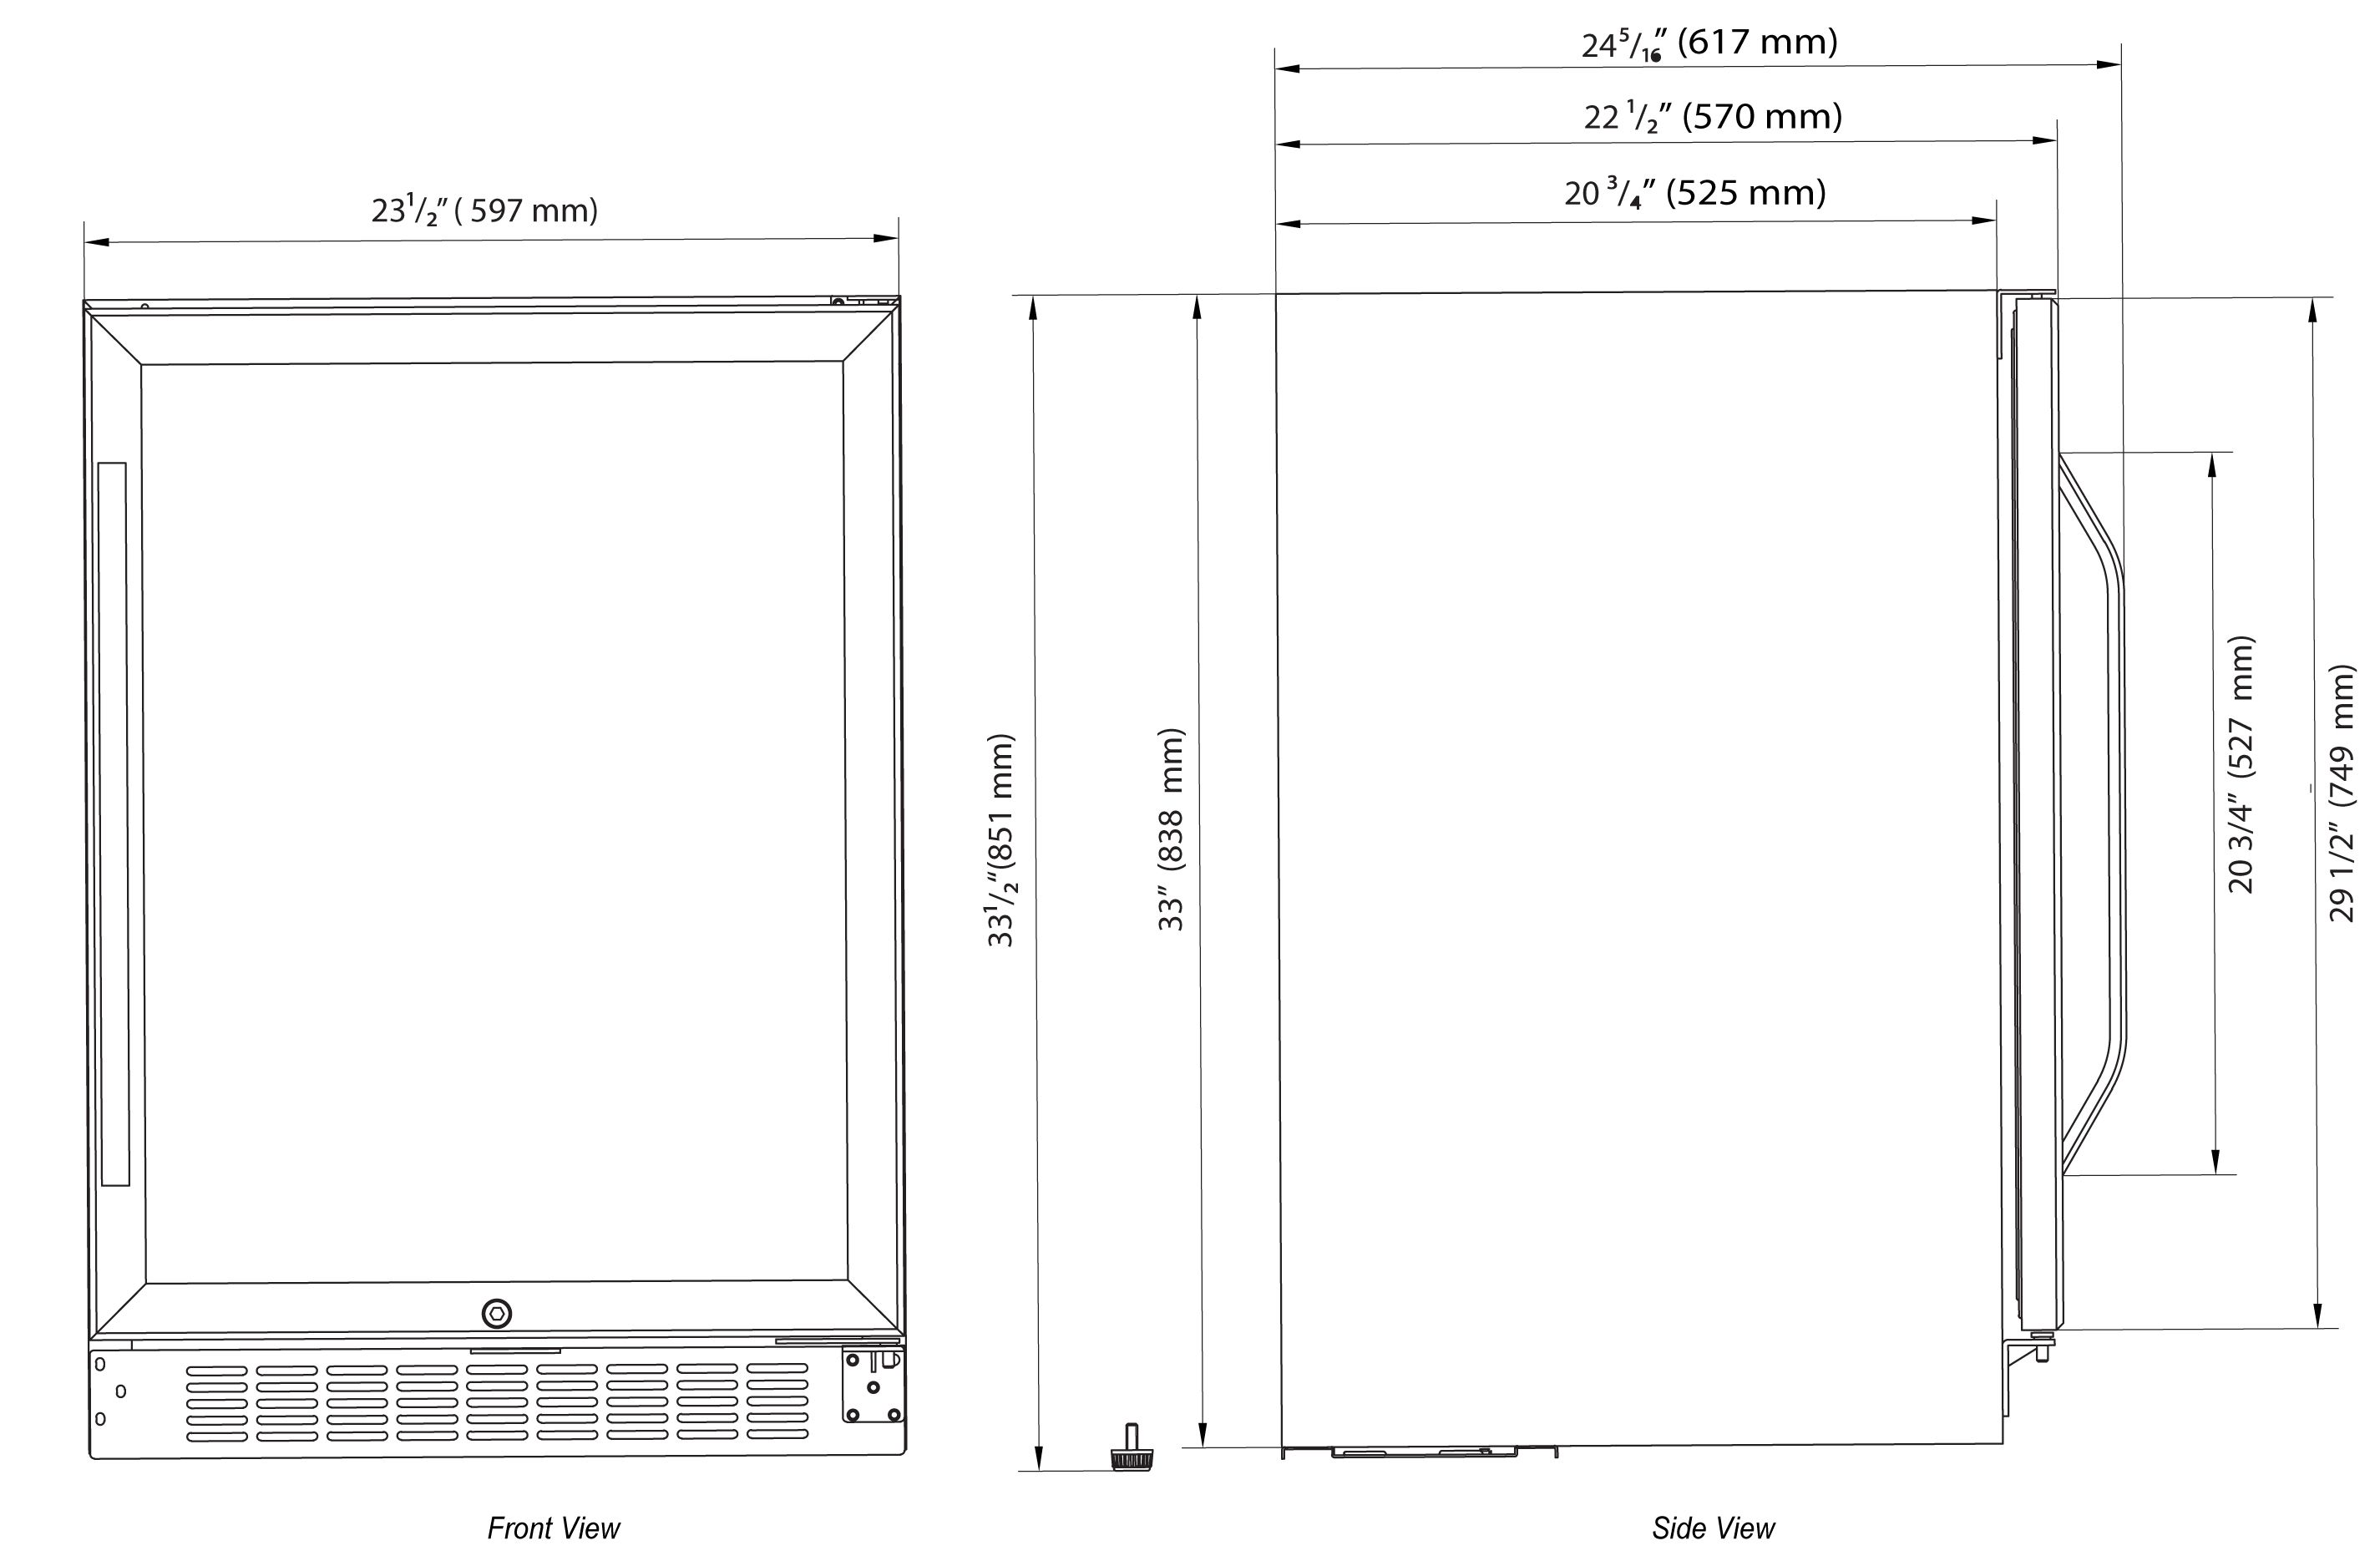 edgestar wiring diagram wiring diagram data val edgestar wiring diagram [ 2850 x 1875 Pixel ]